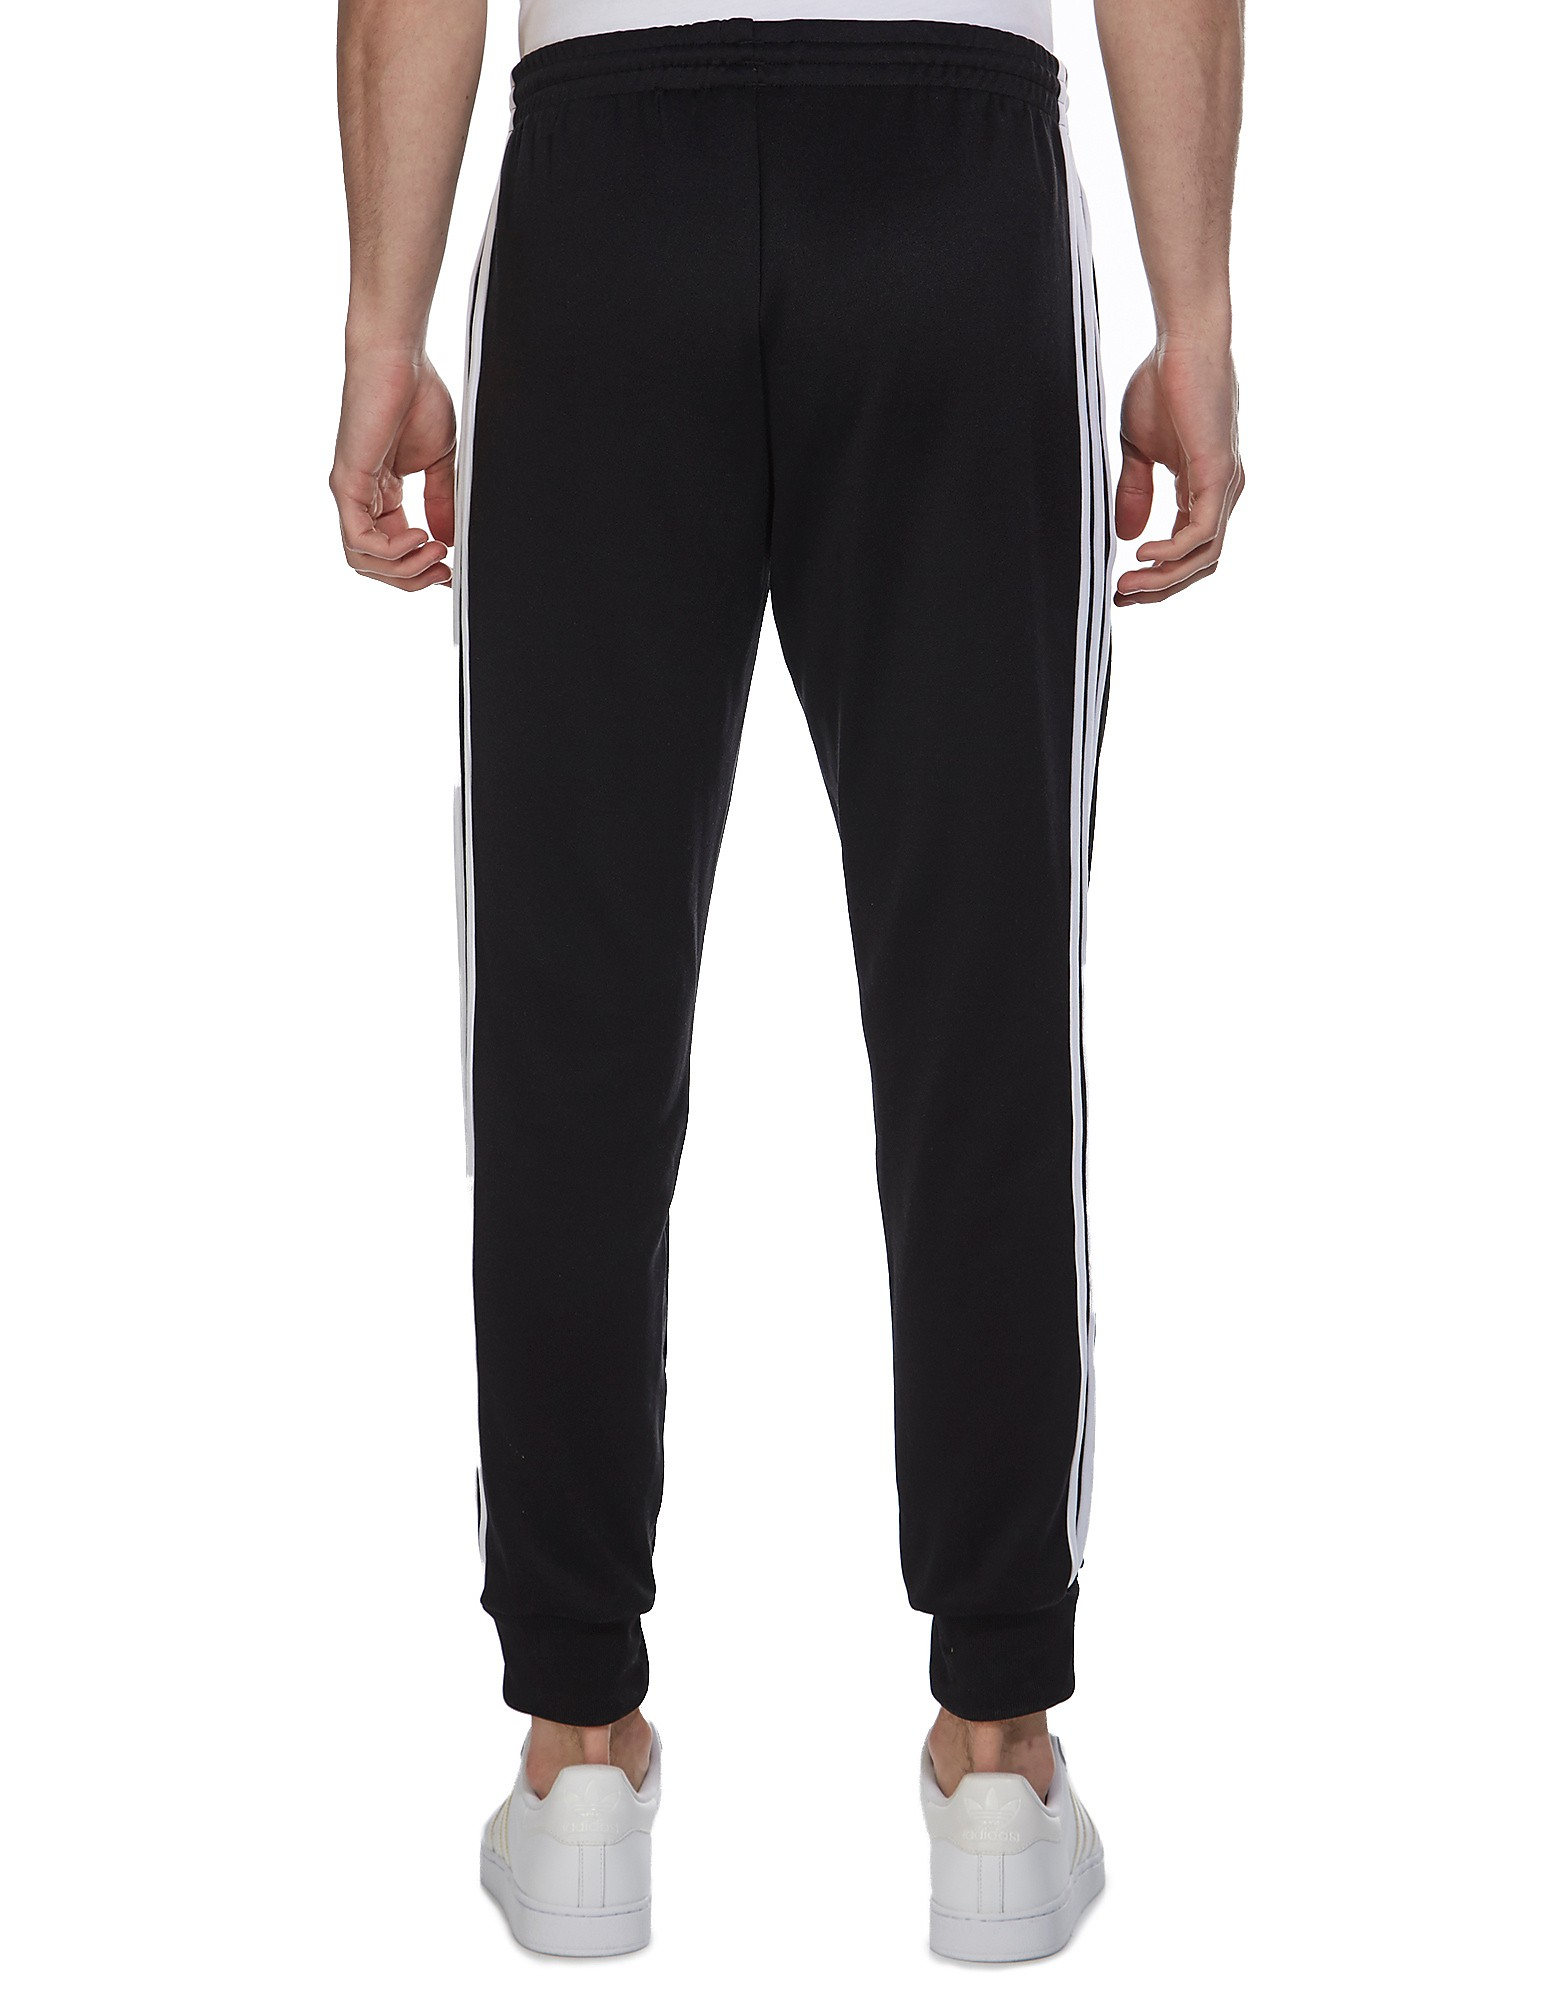 adidas Originals Superstar Cuff Pants